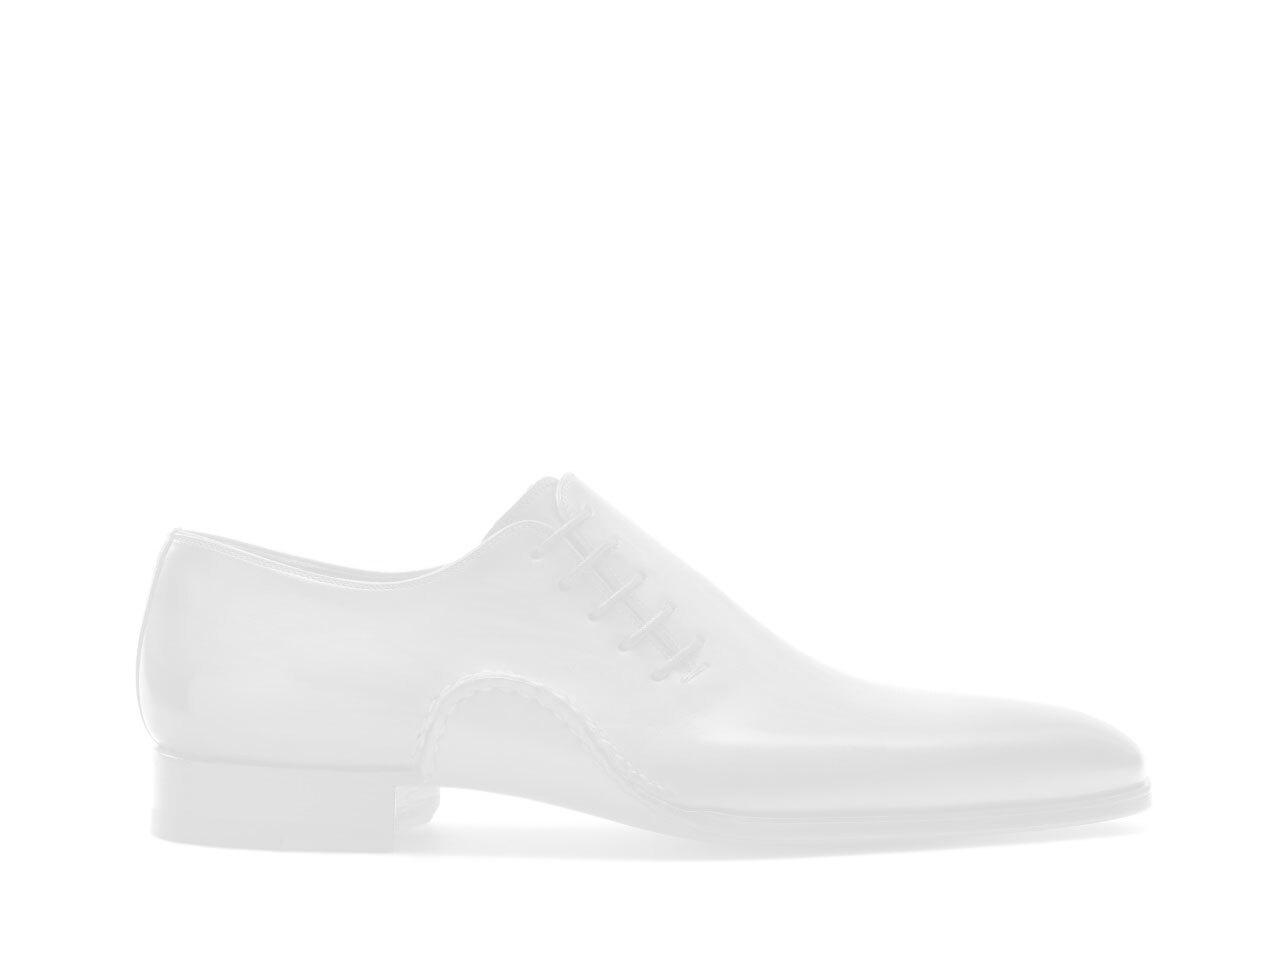 Black business casual socks - Magnanni